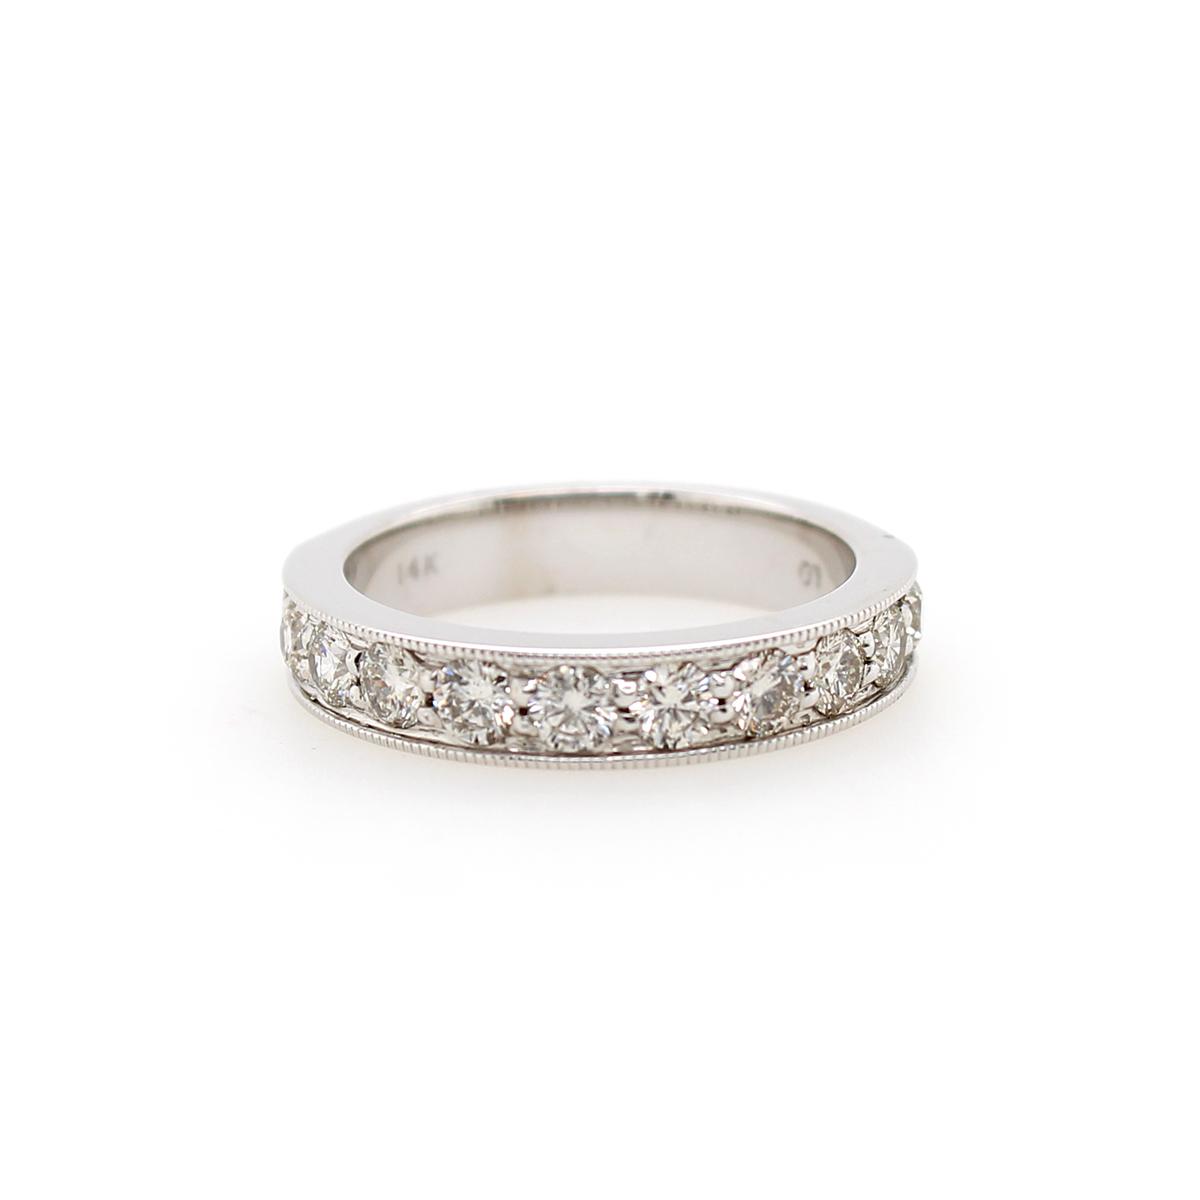 Shefi Diamonds 14 Karat White Gold 1 Carat Millgrain Edge Wedding Band